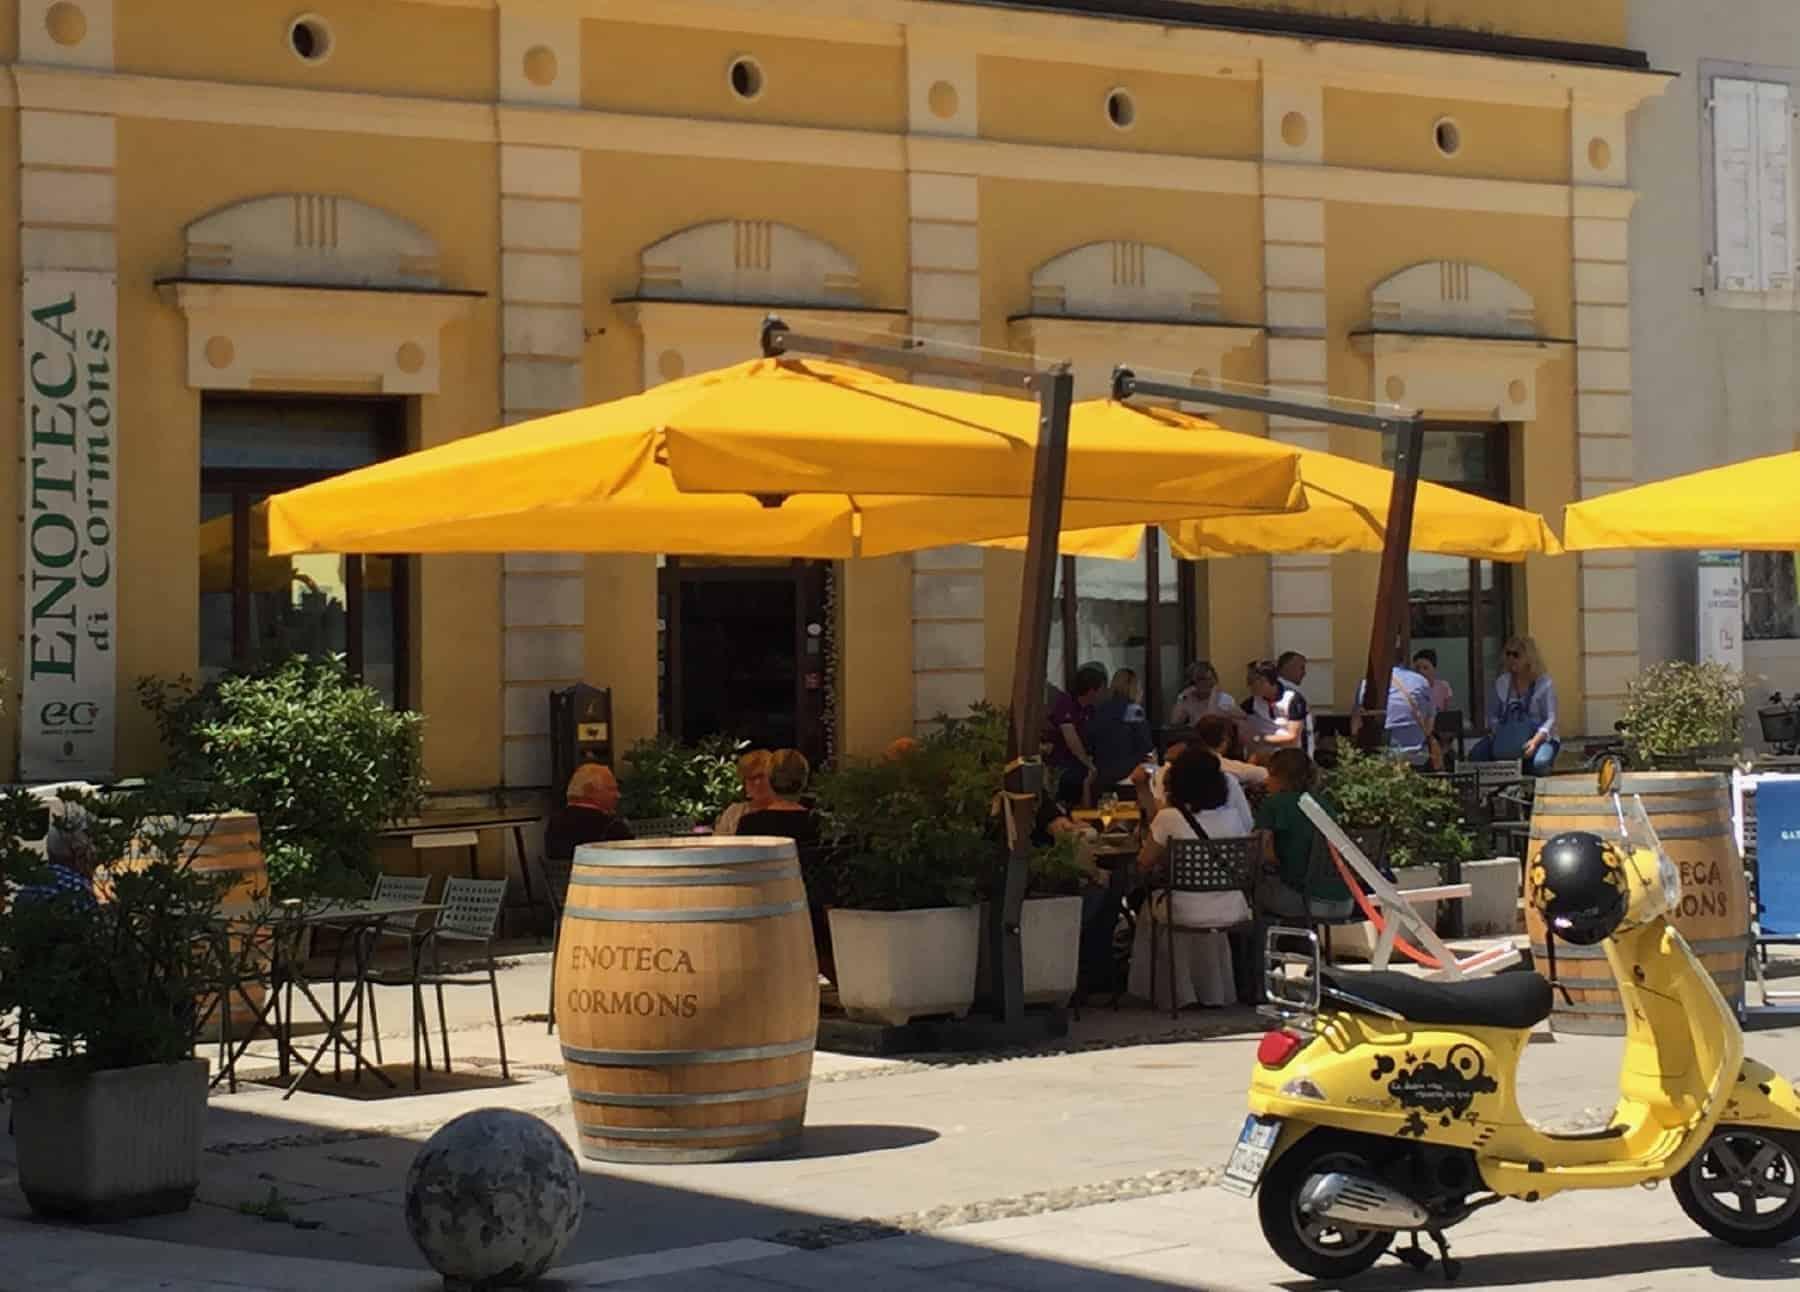 Enoteca Cormons in Friuli